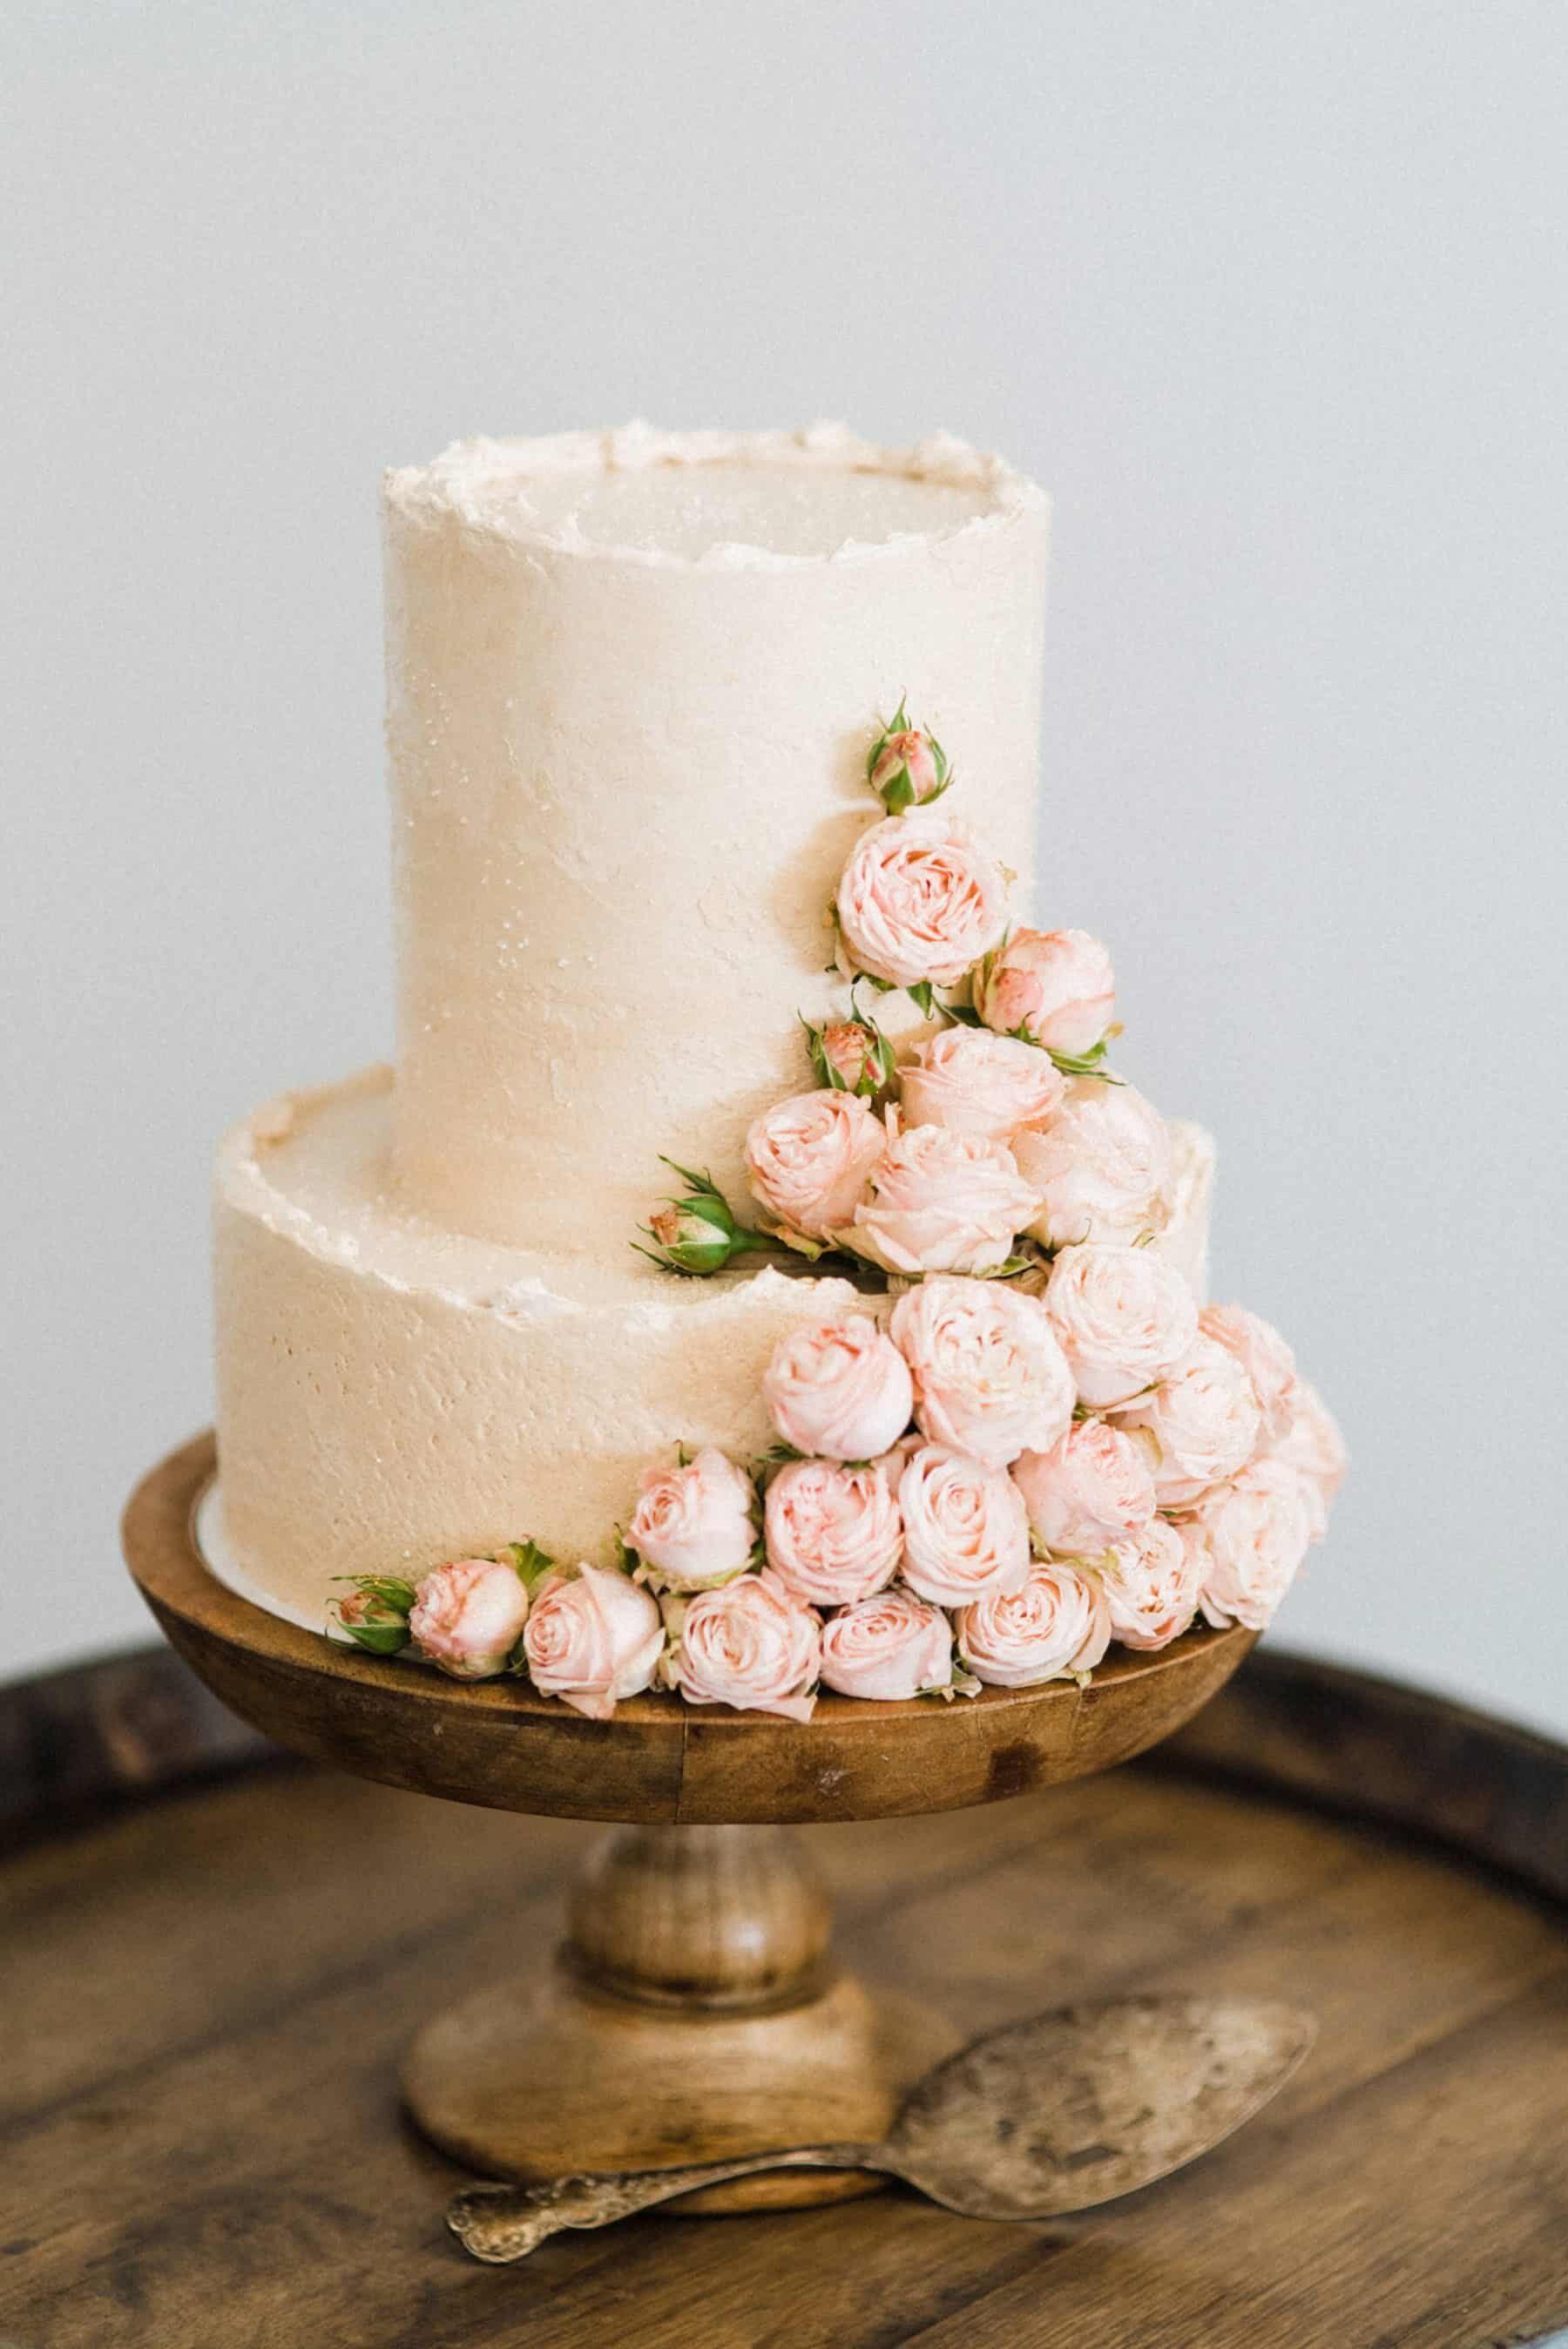 Pastel pink wedding cake with roses